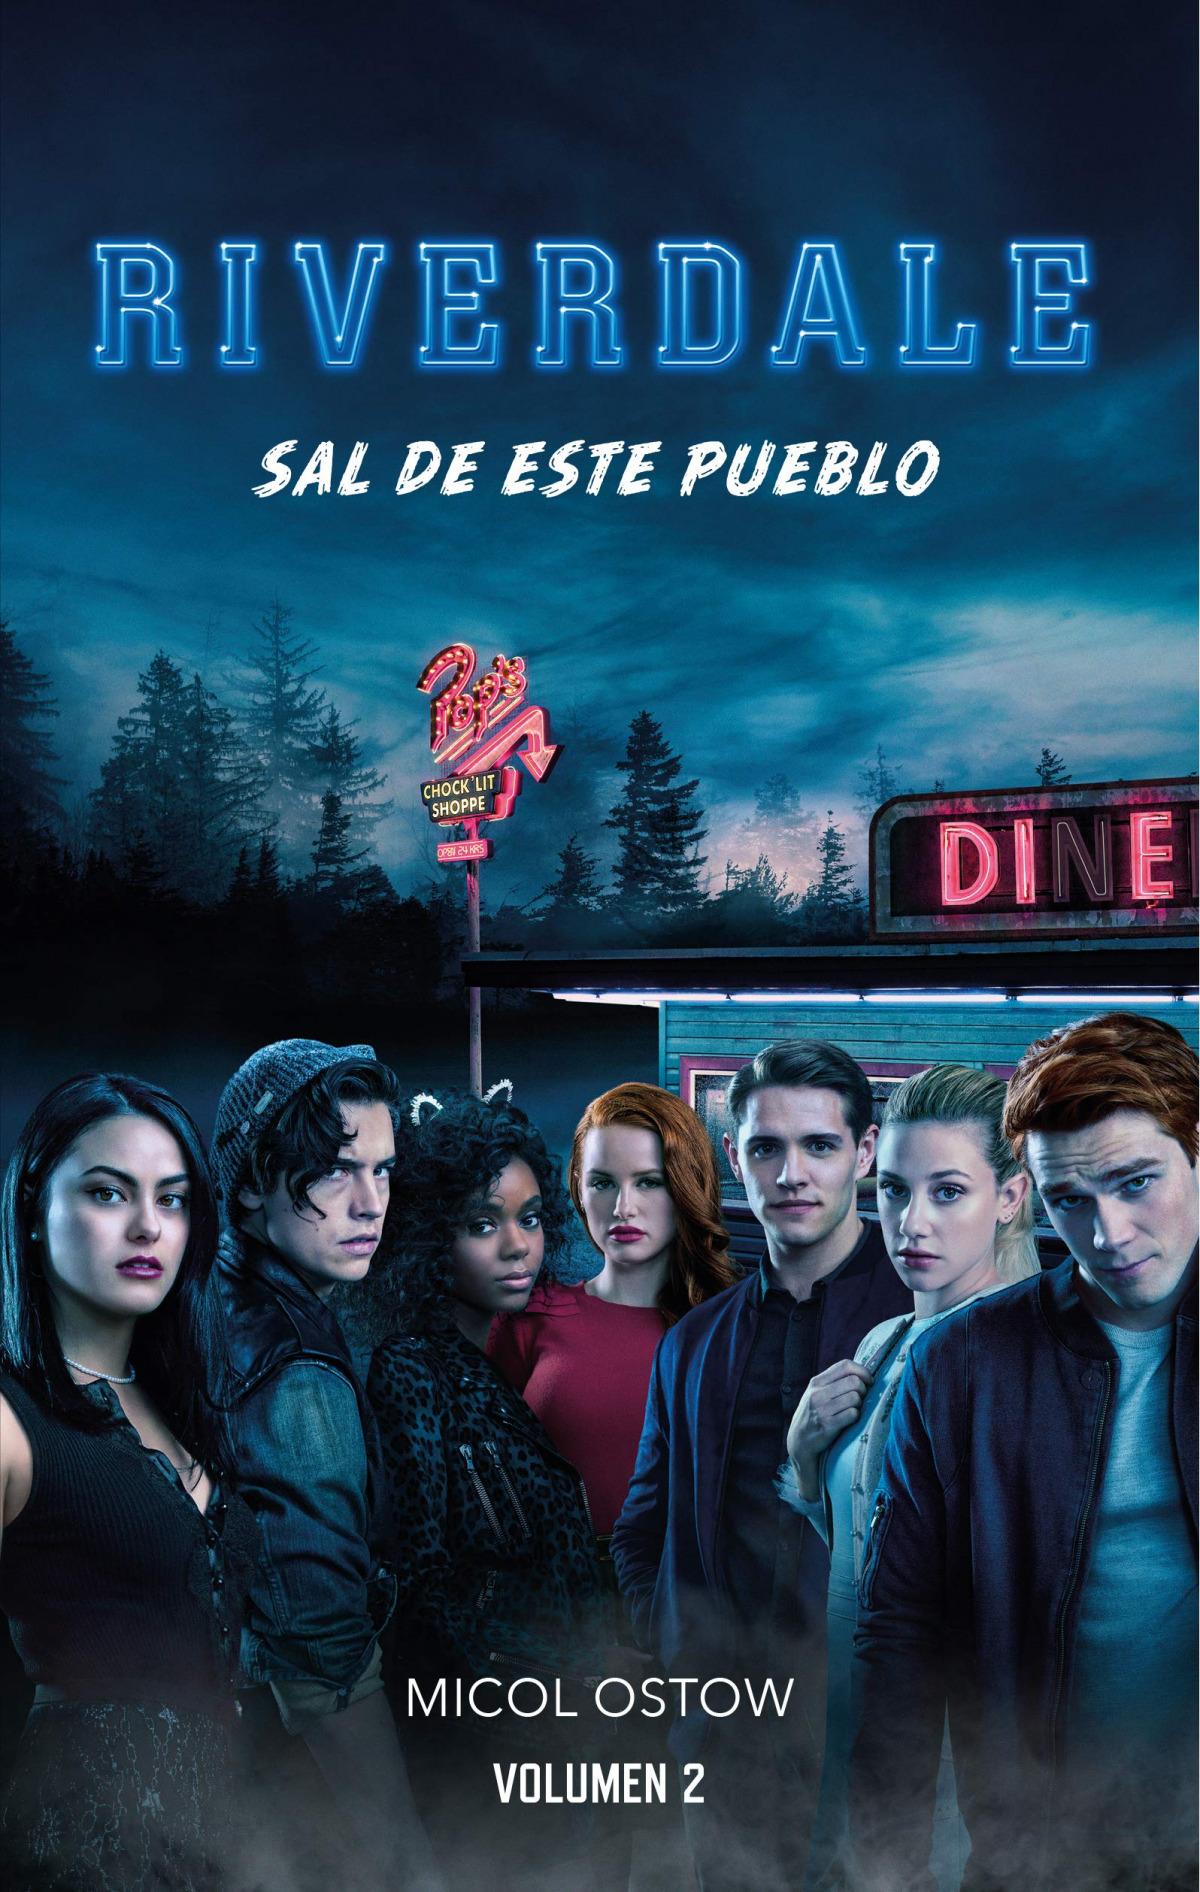 Riverdale volumen 2